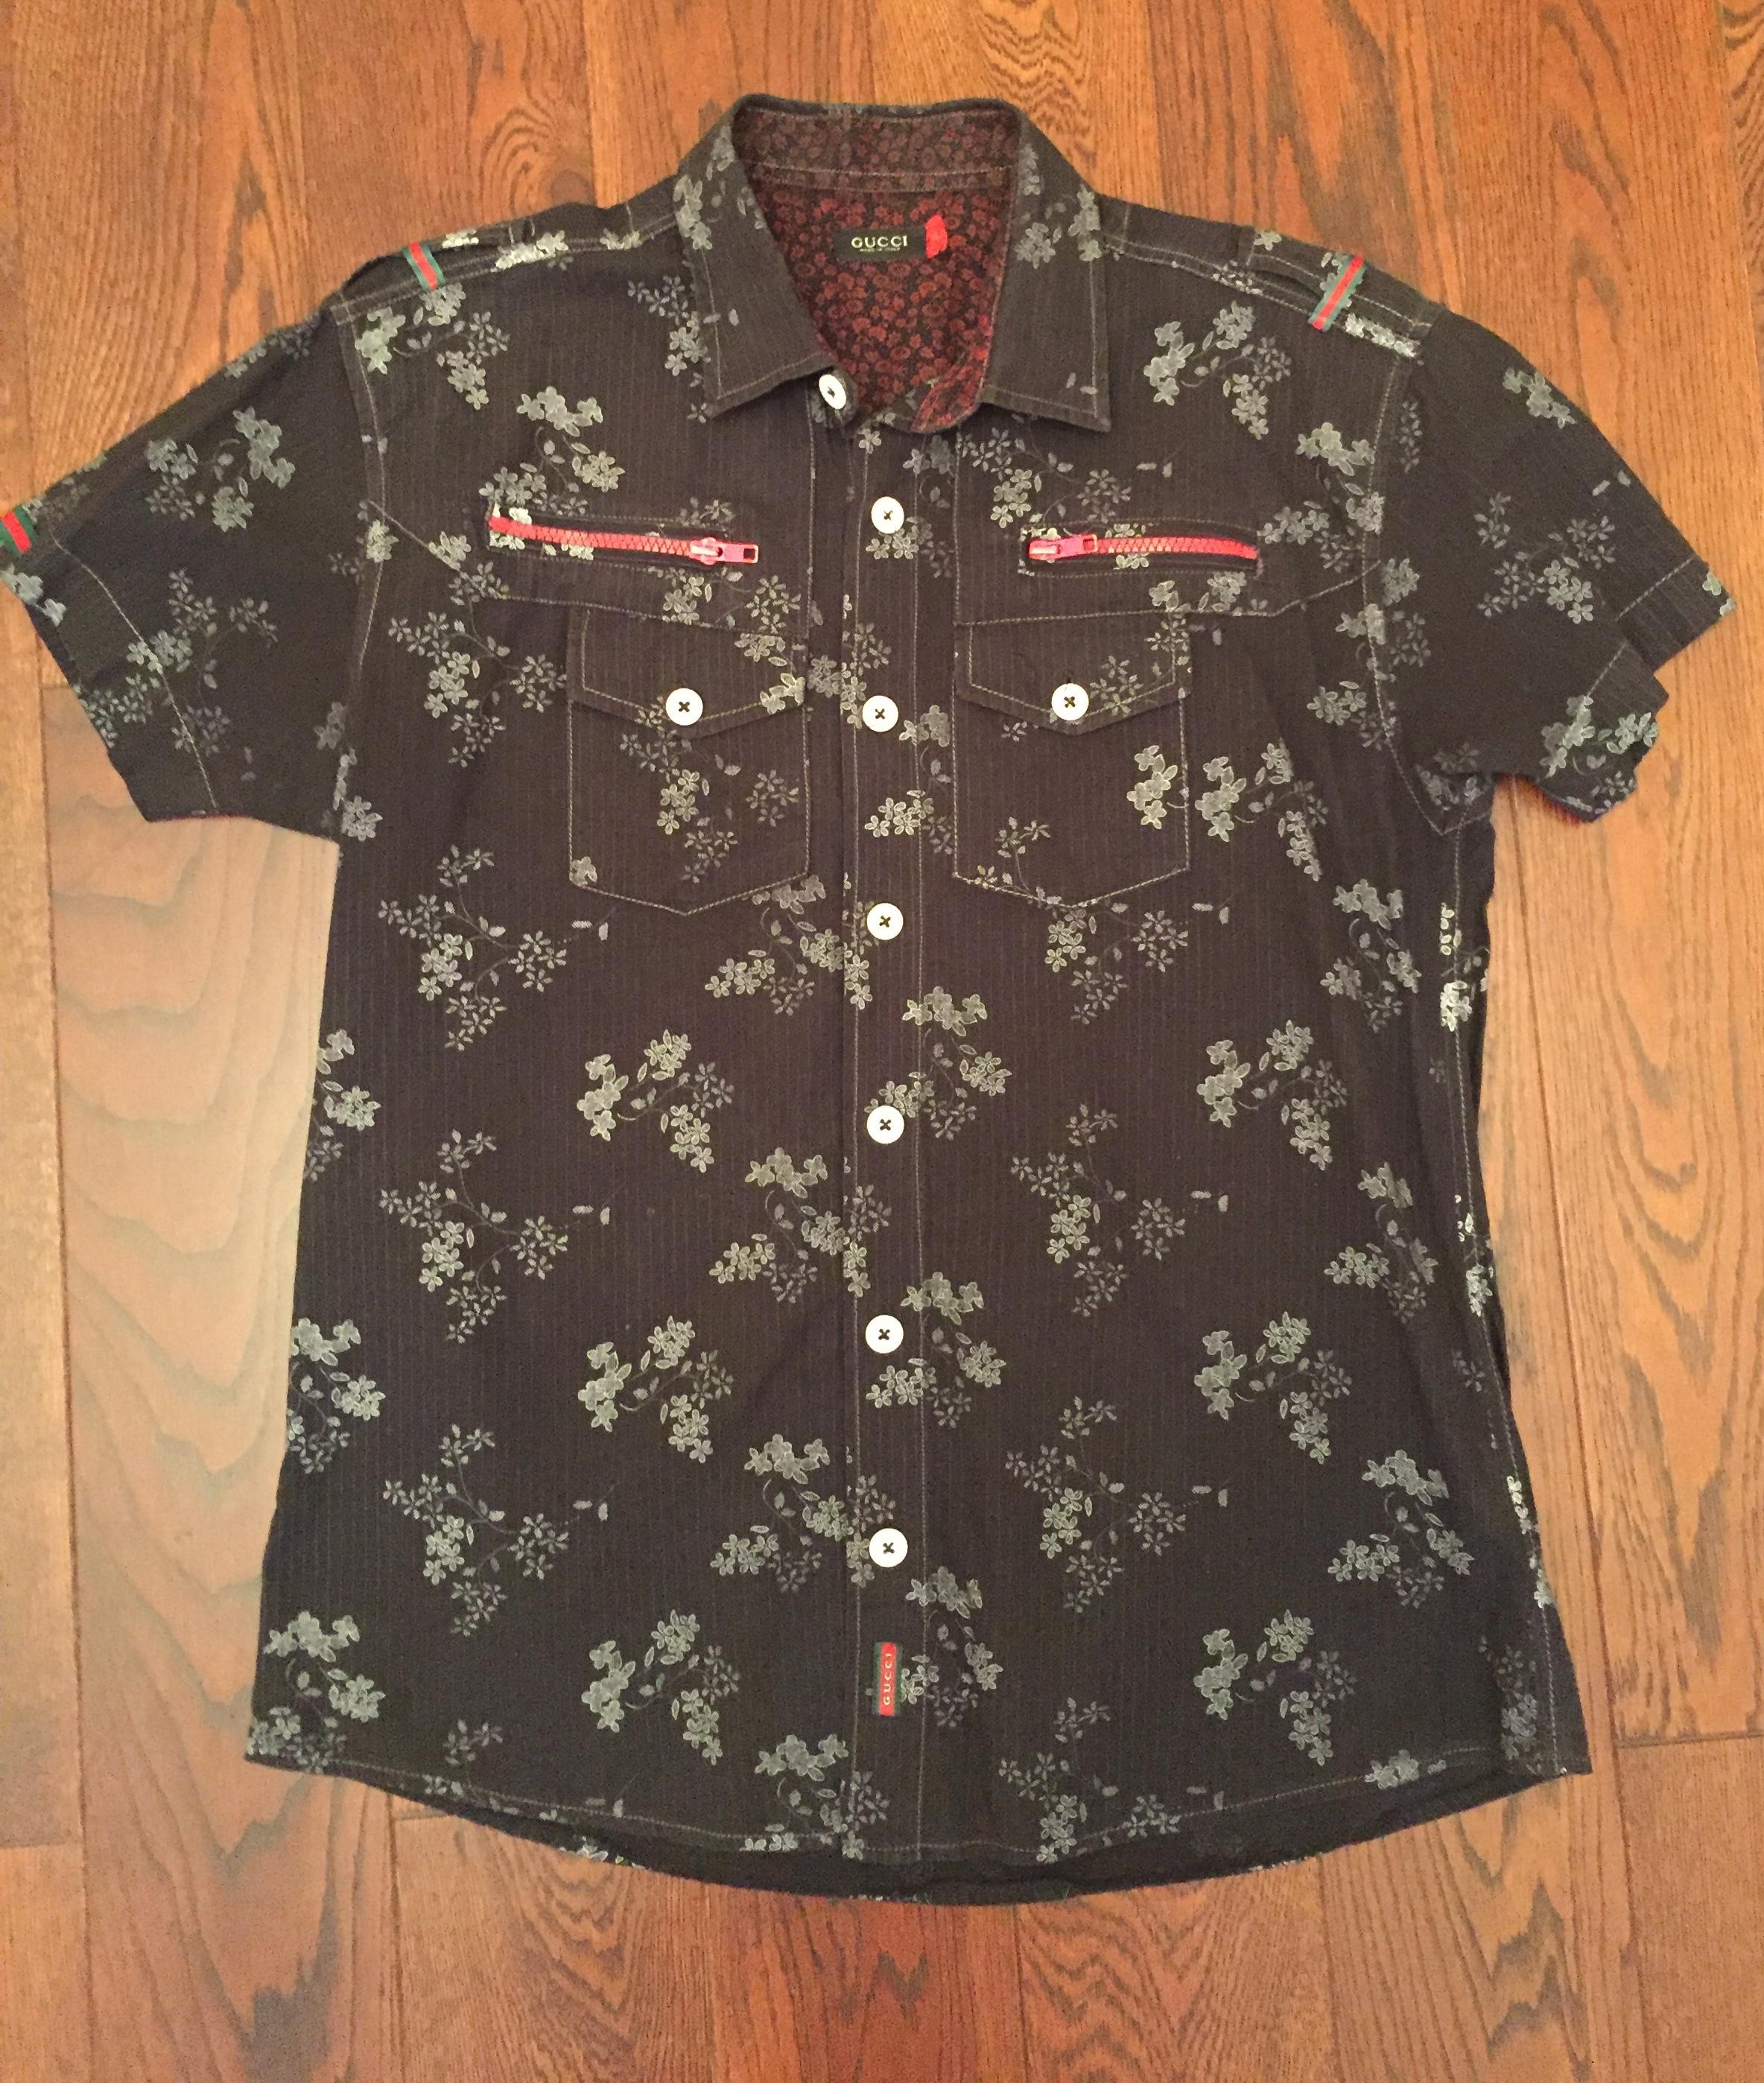 934e92c12804 Купить рубашку Gucci за 1000 руб. в интернет магазине - бутике с ...